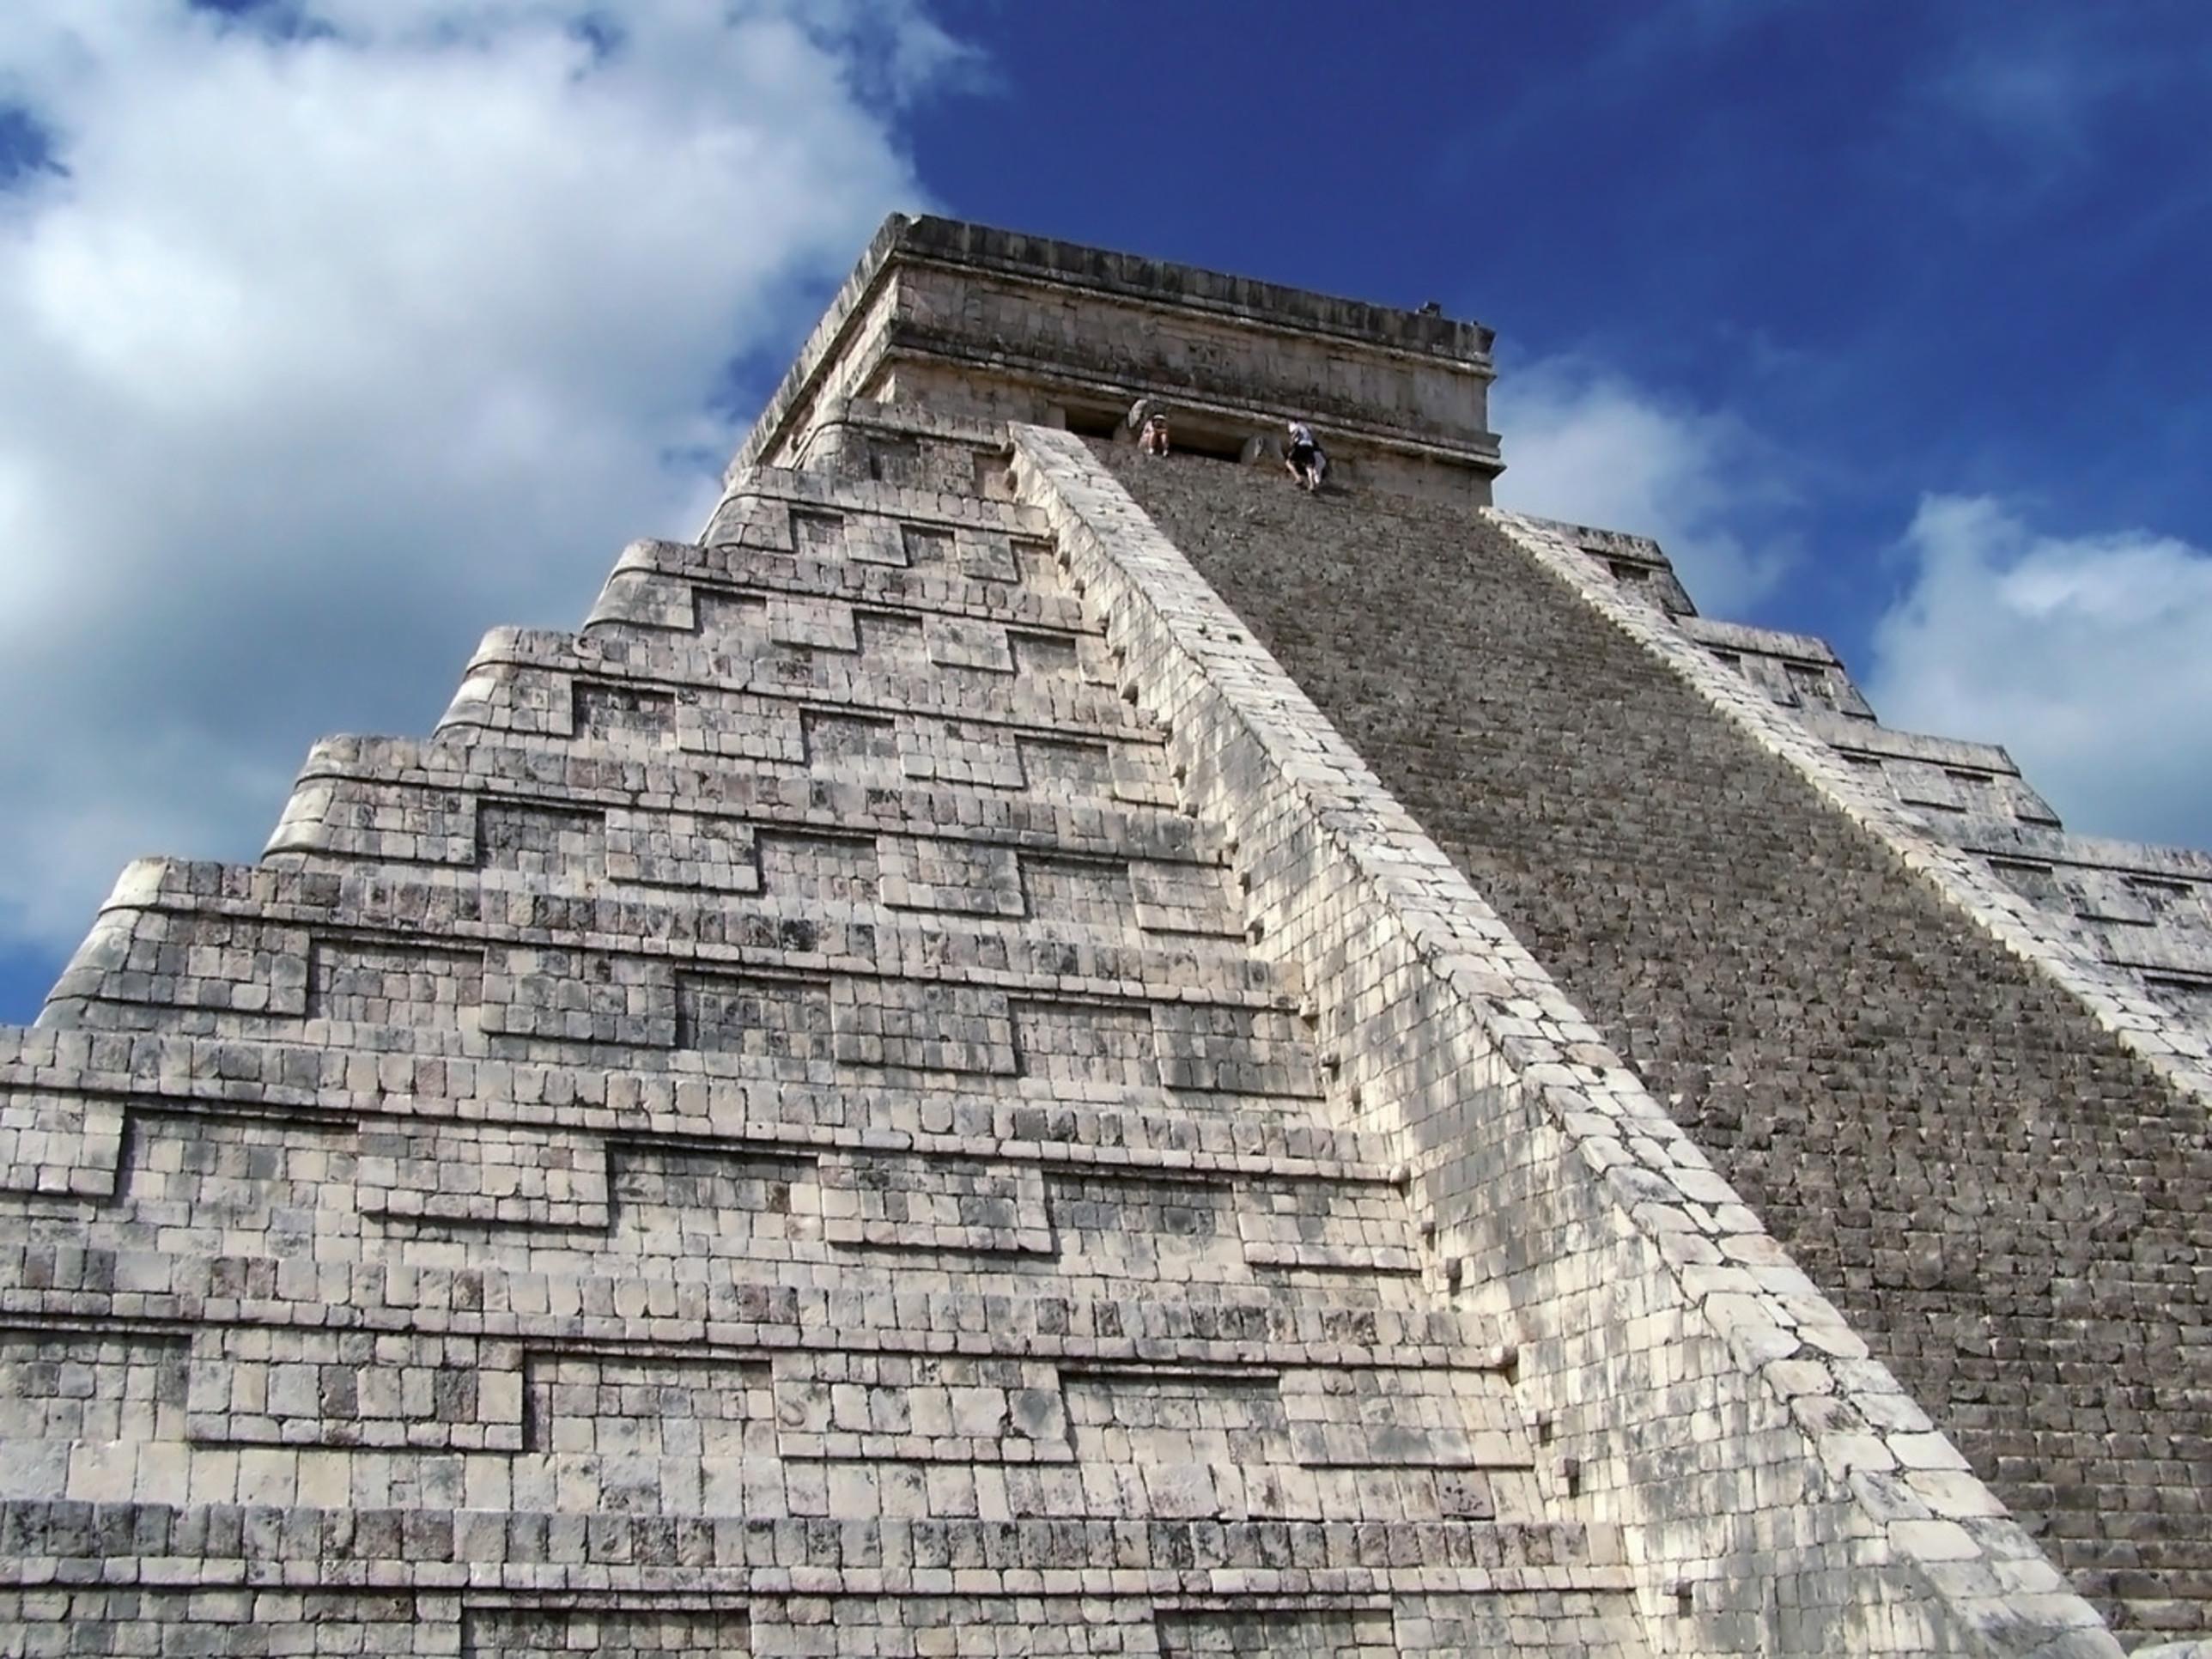 Happy Birthday RIU! 20 years of service in Mexico - RIU com